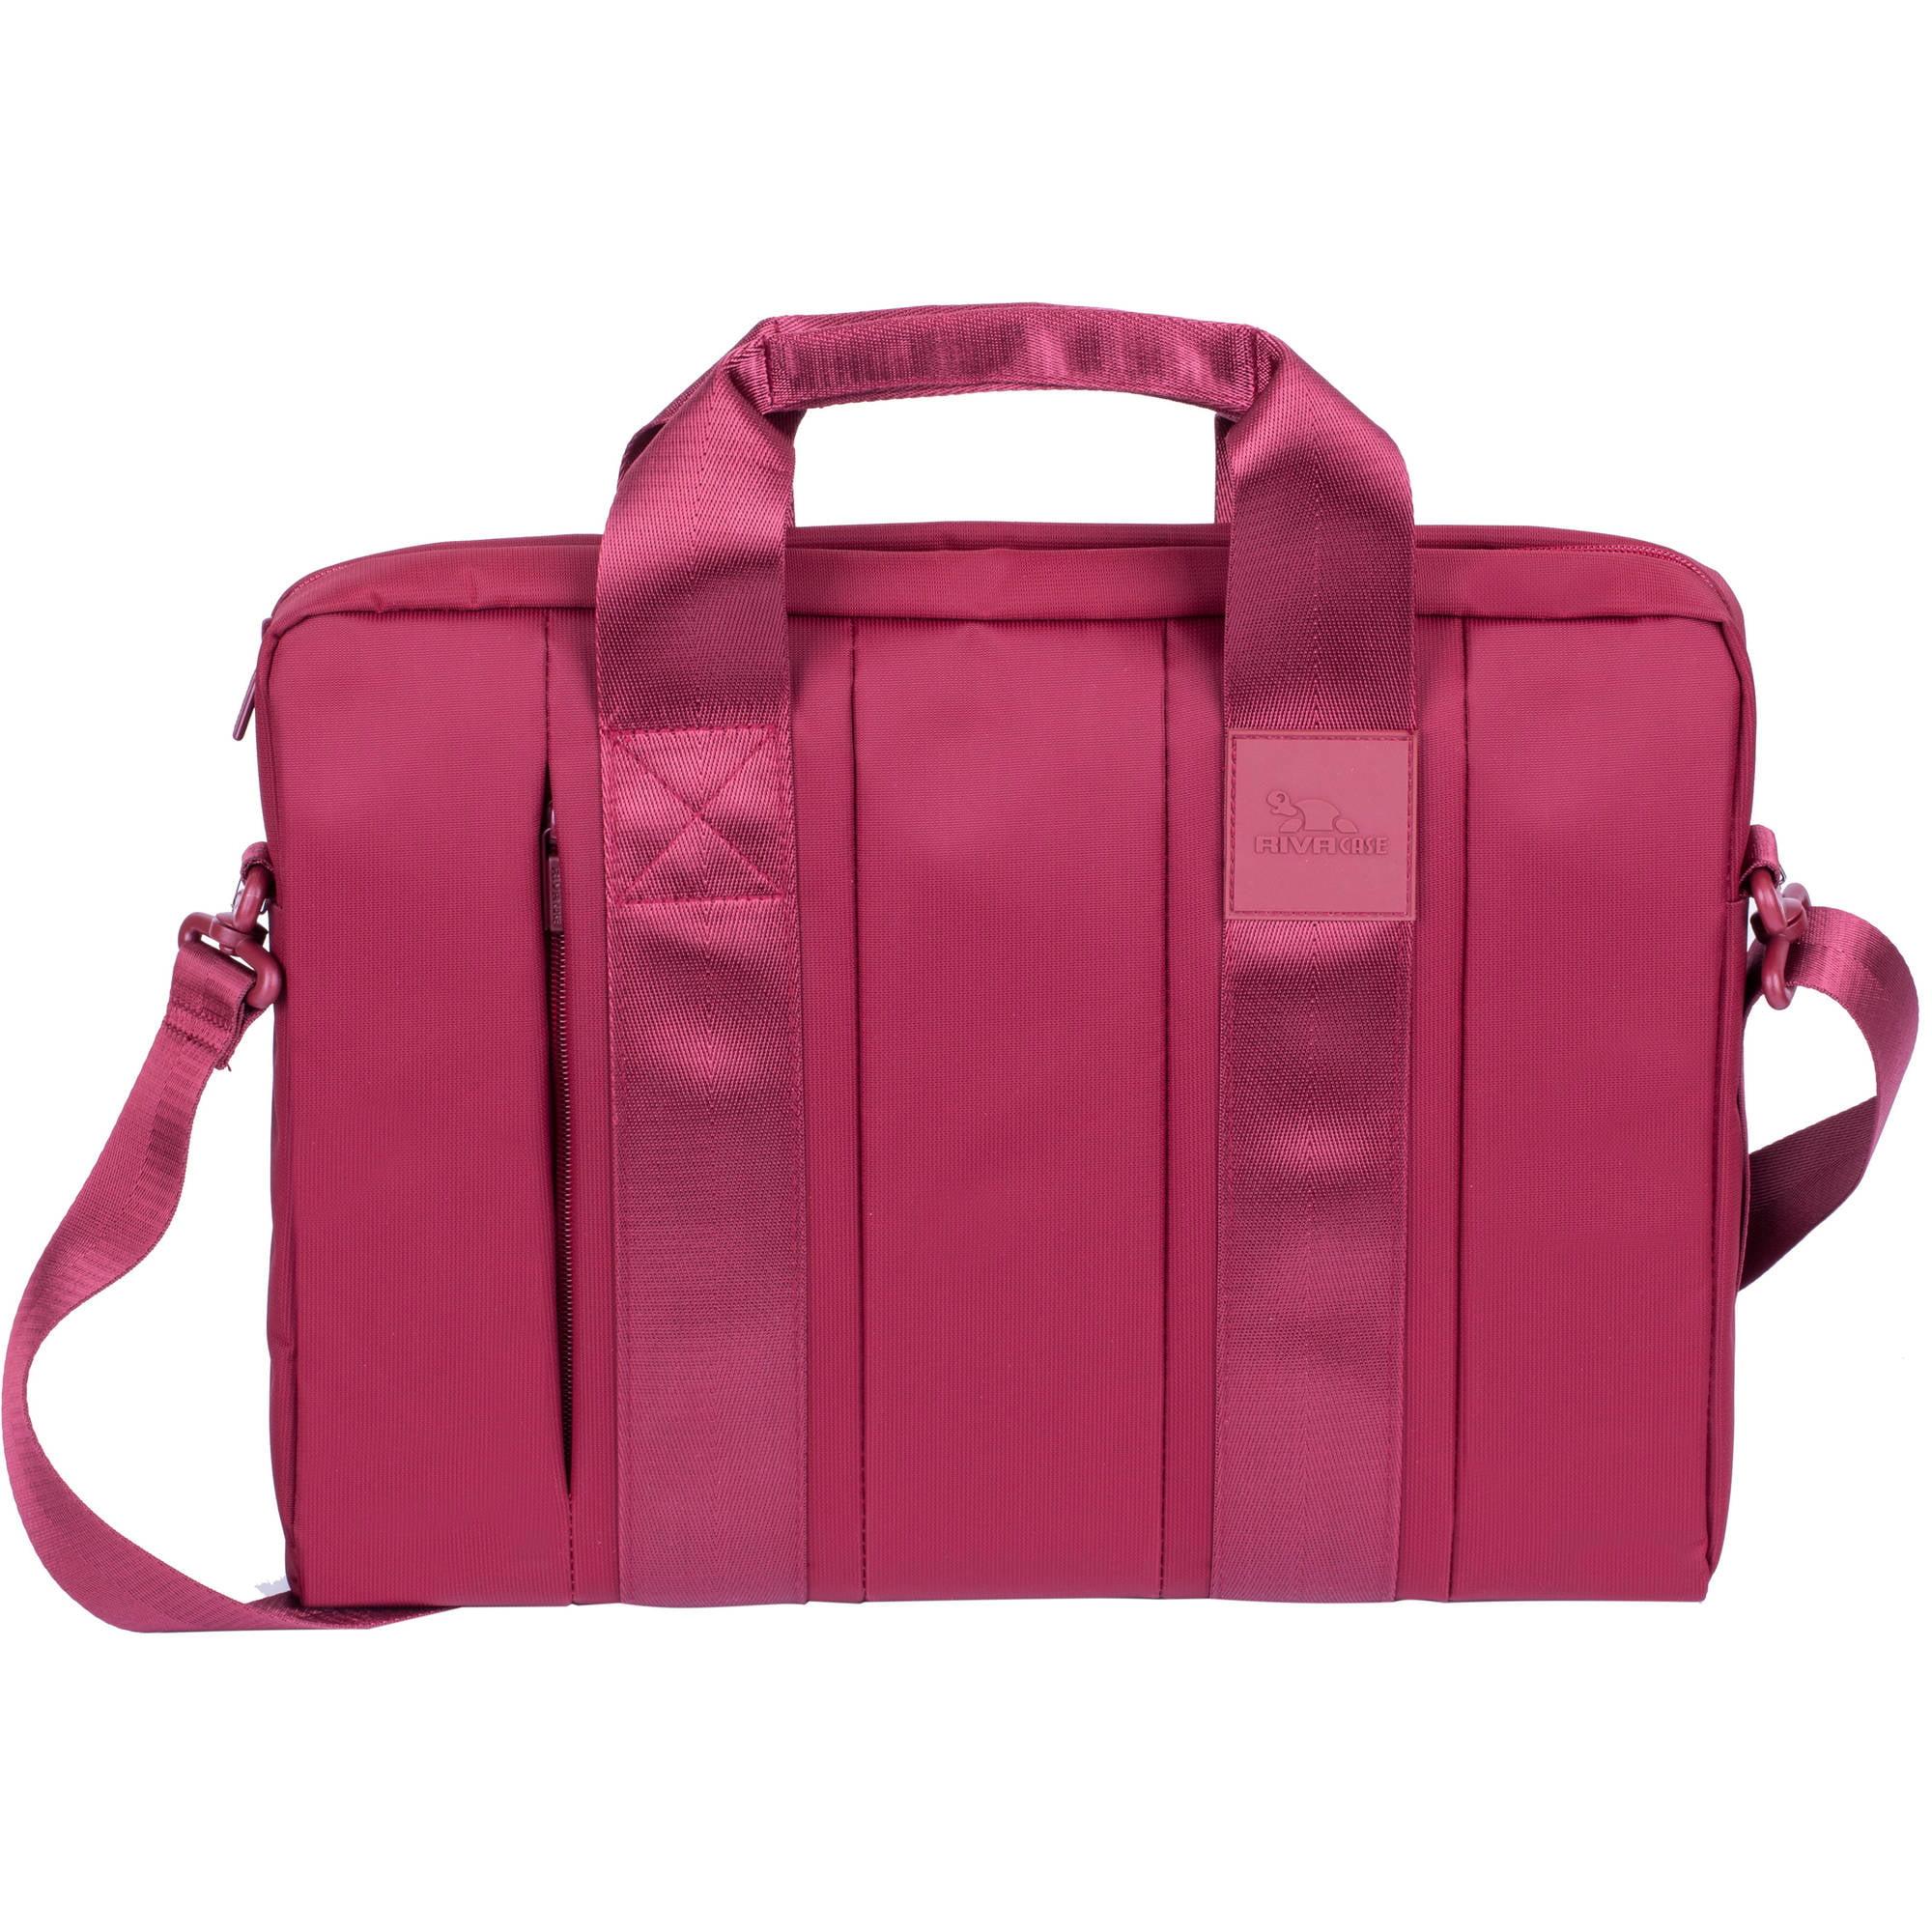 "RIVACASE 15.6"" Laptop Bag 8830, Red"